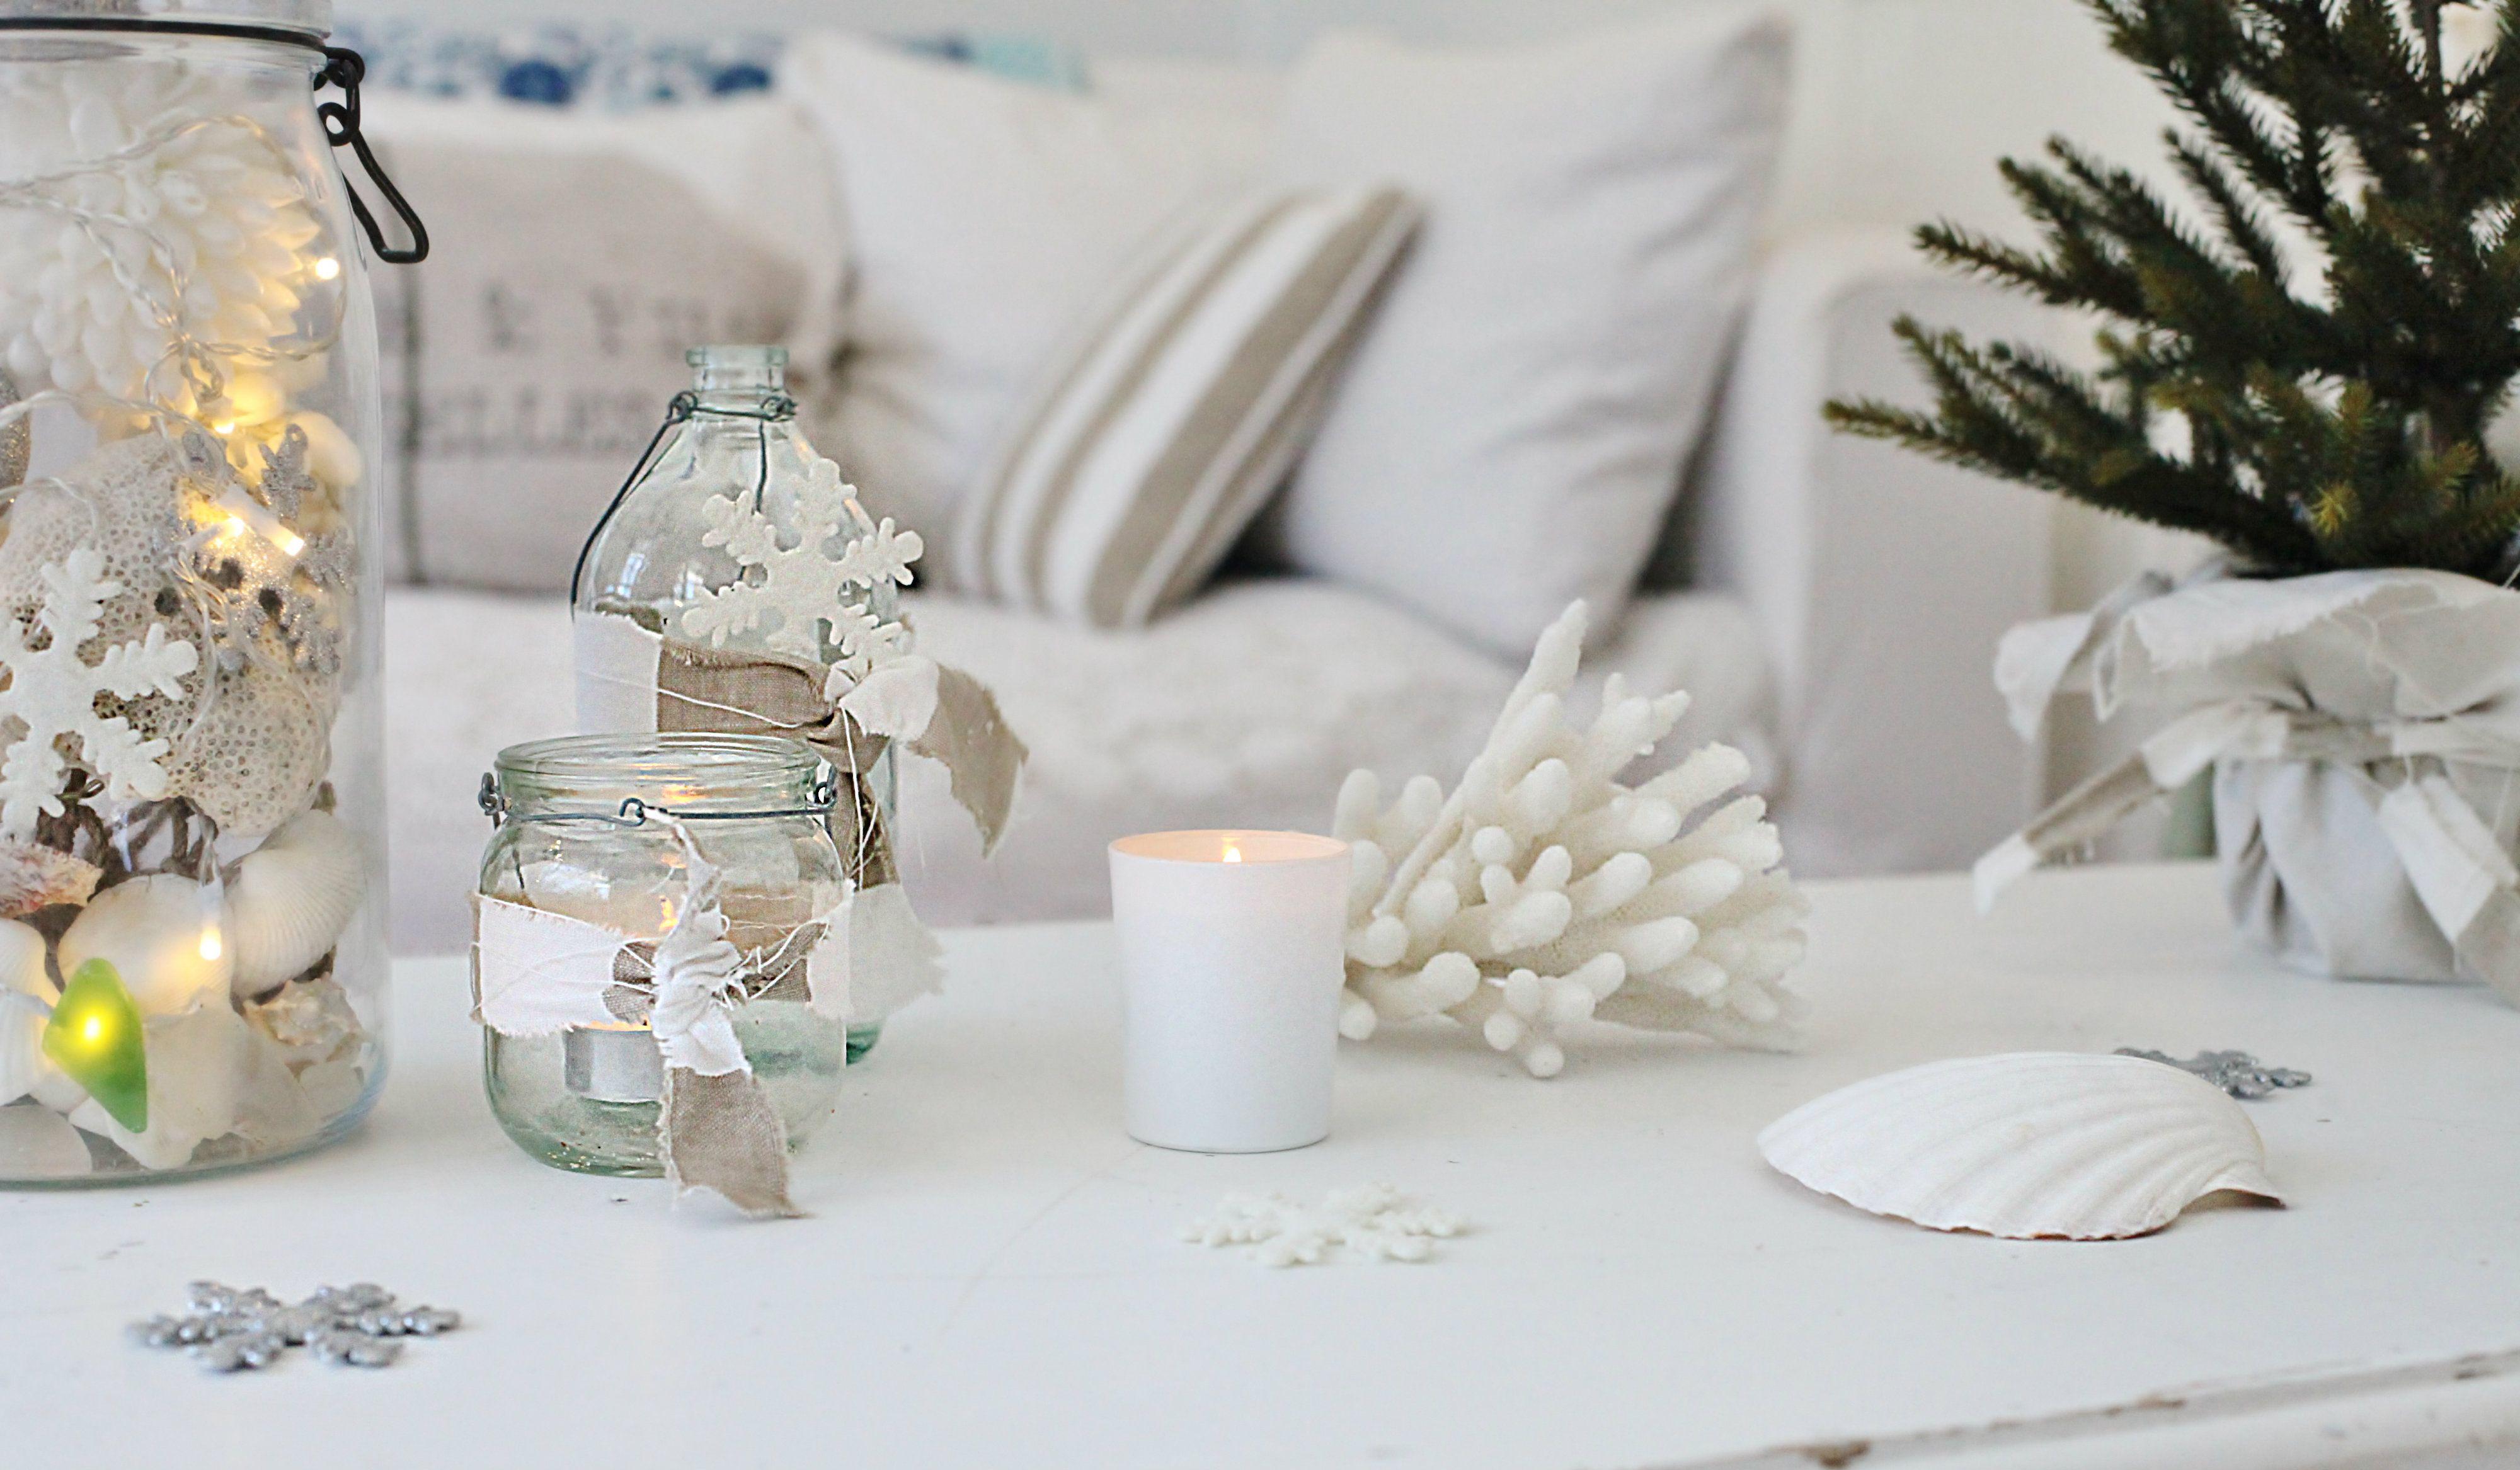 Love Your Christmas Home DAY 6 - Beach Decor Blog, Coastal Blog, Coastal Decorating